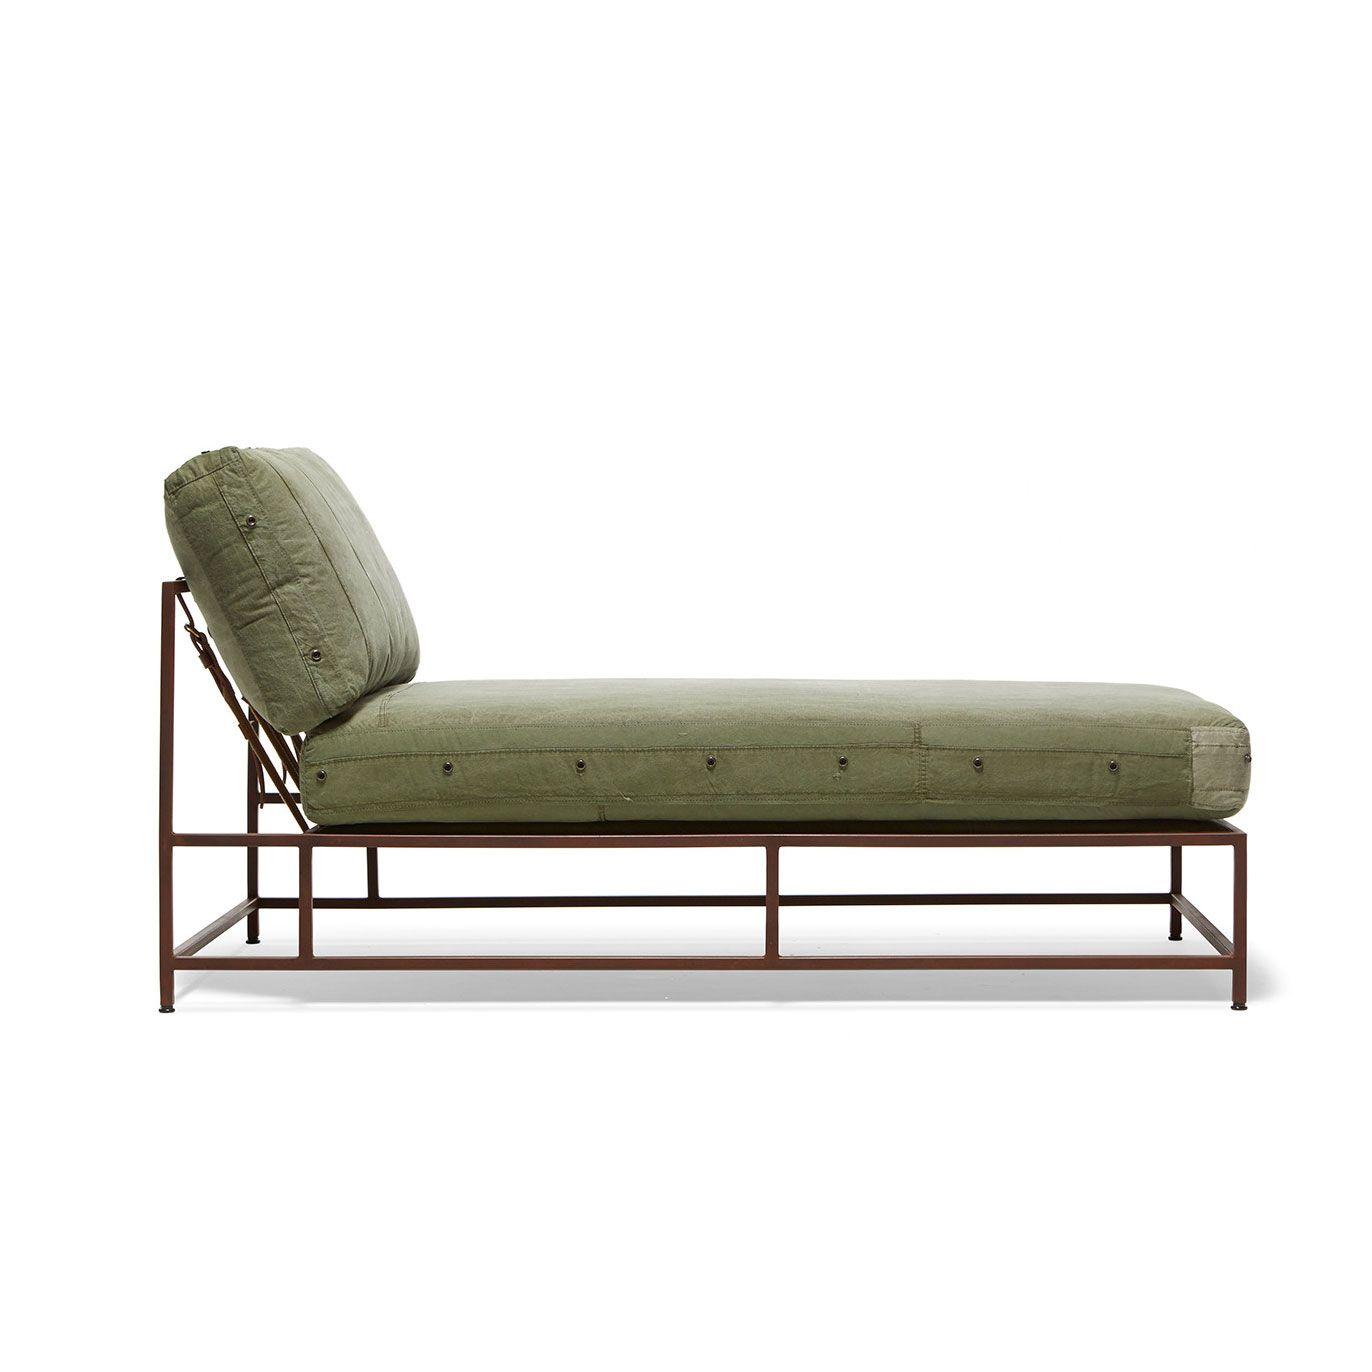 Inheritance Chaise Lounge Contemporary Sofa Modern Sofa Chaise Lounge